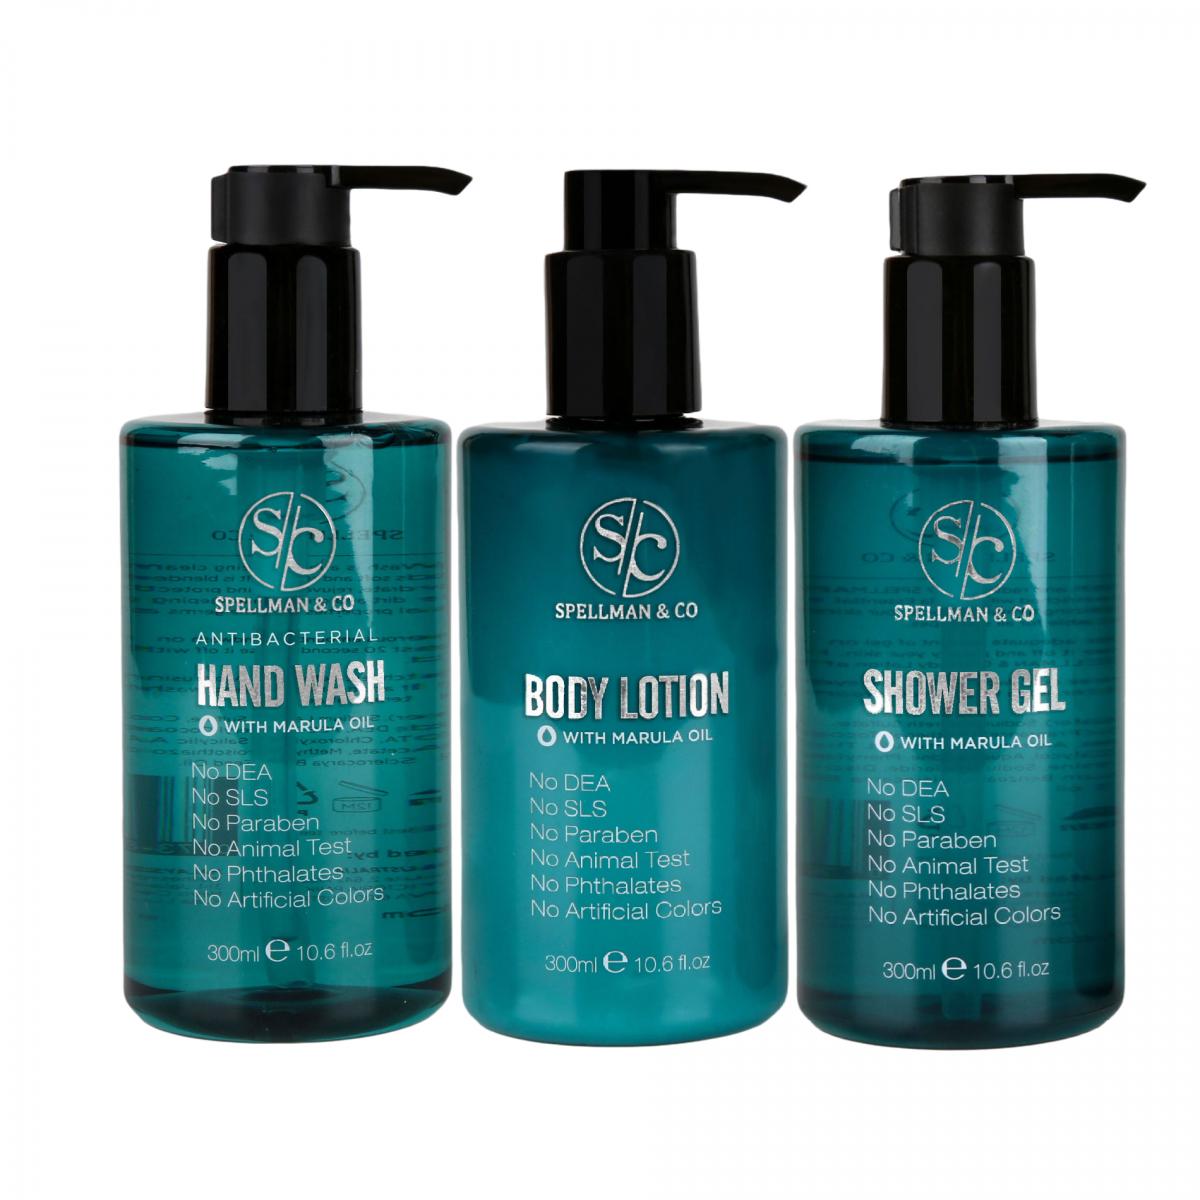 Shower Gel + AntiBacterial Hand Wash + Body Lotion